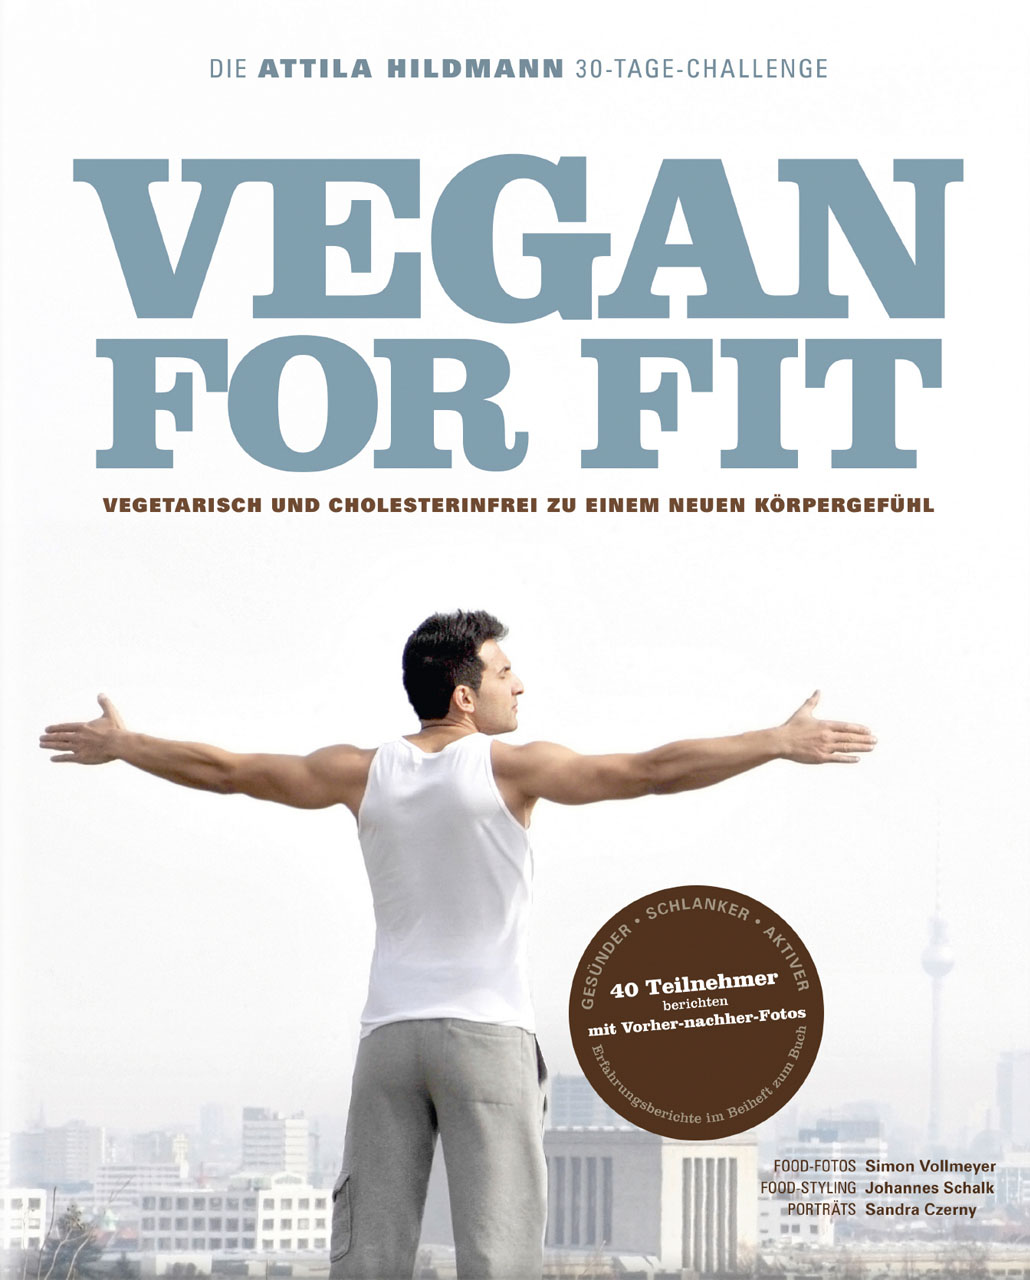 Buch-Cover: Vegan for Fit (von Attila Hildmann)